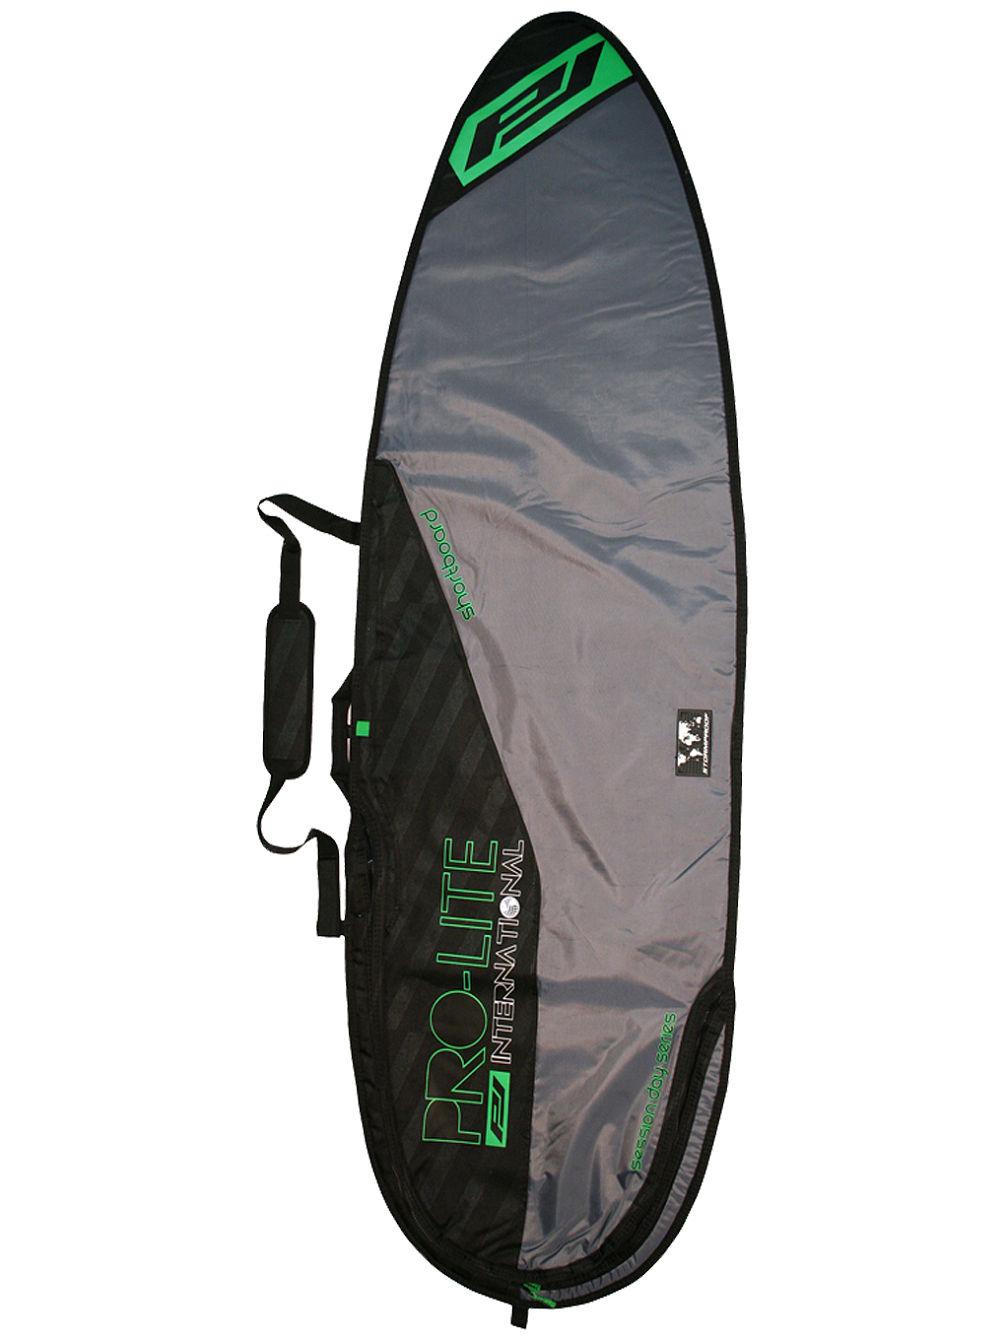 Buy pro lite session fish hybrid big short surfboard for Hybrid fish surfboard